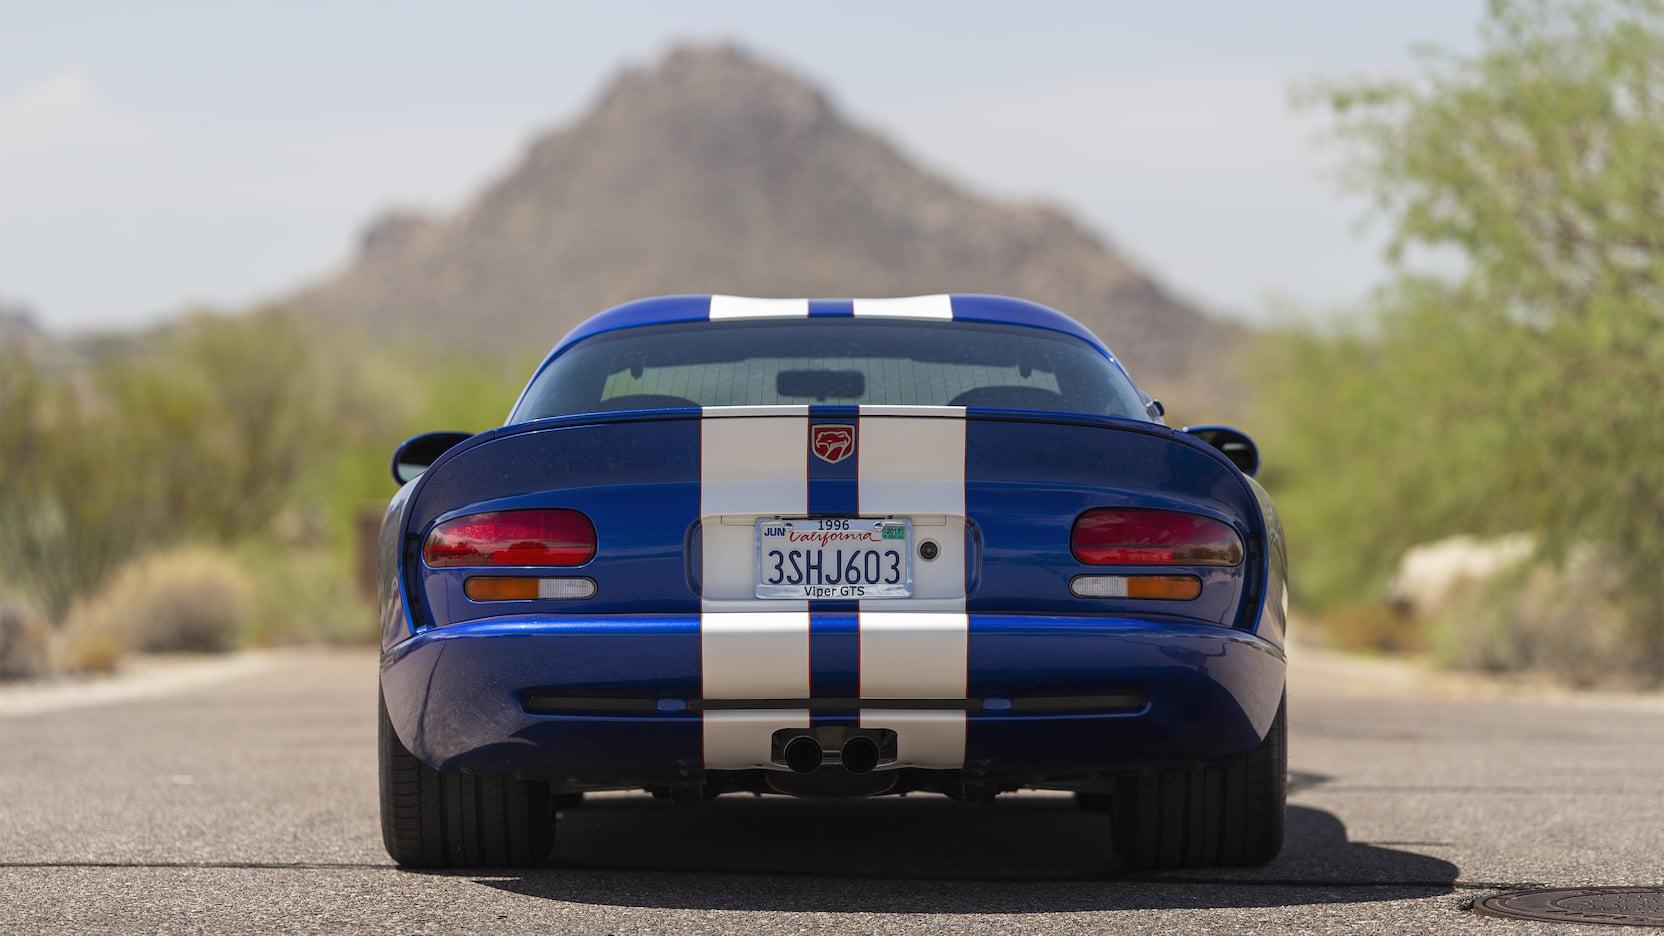 1996 Dodge Viper GTS rear